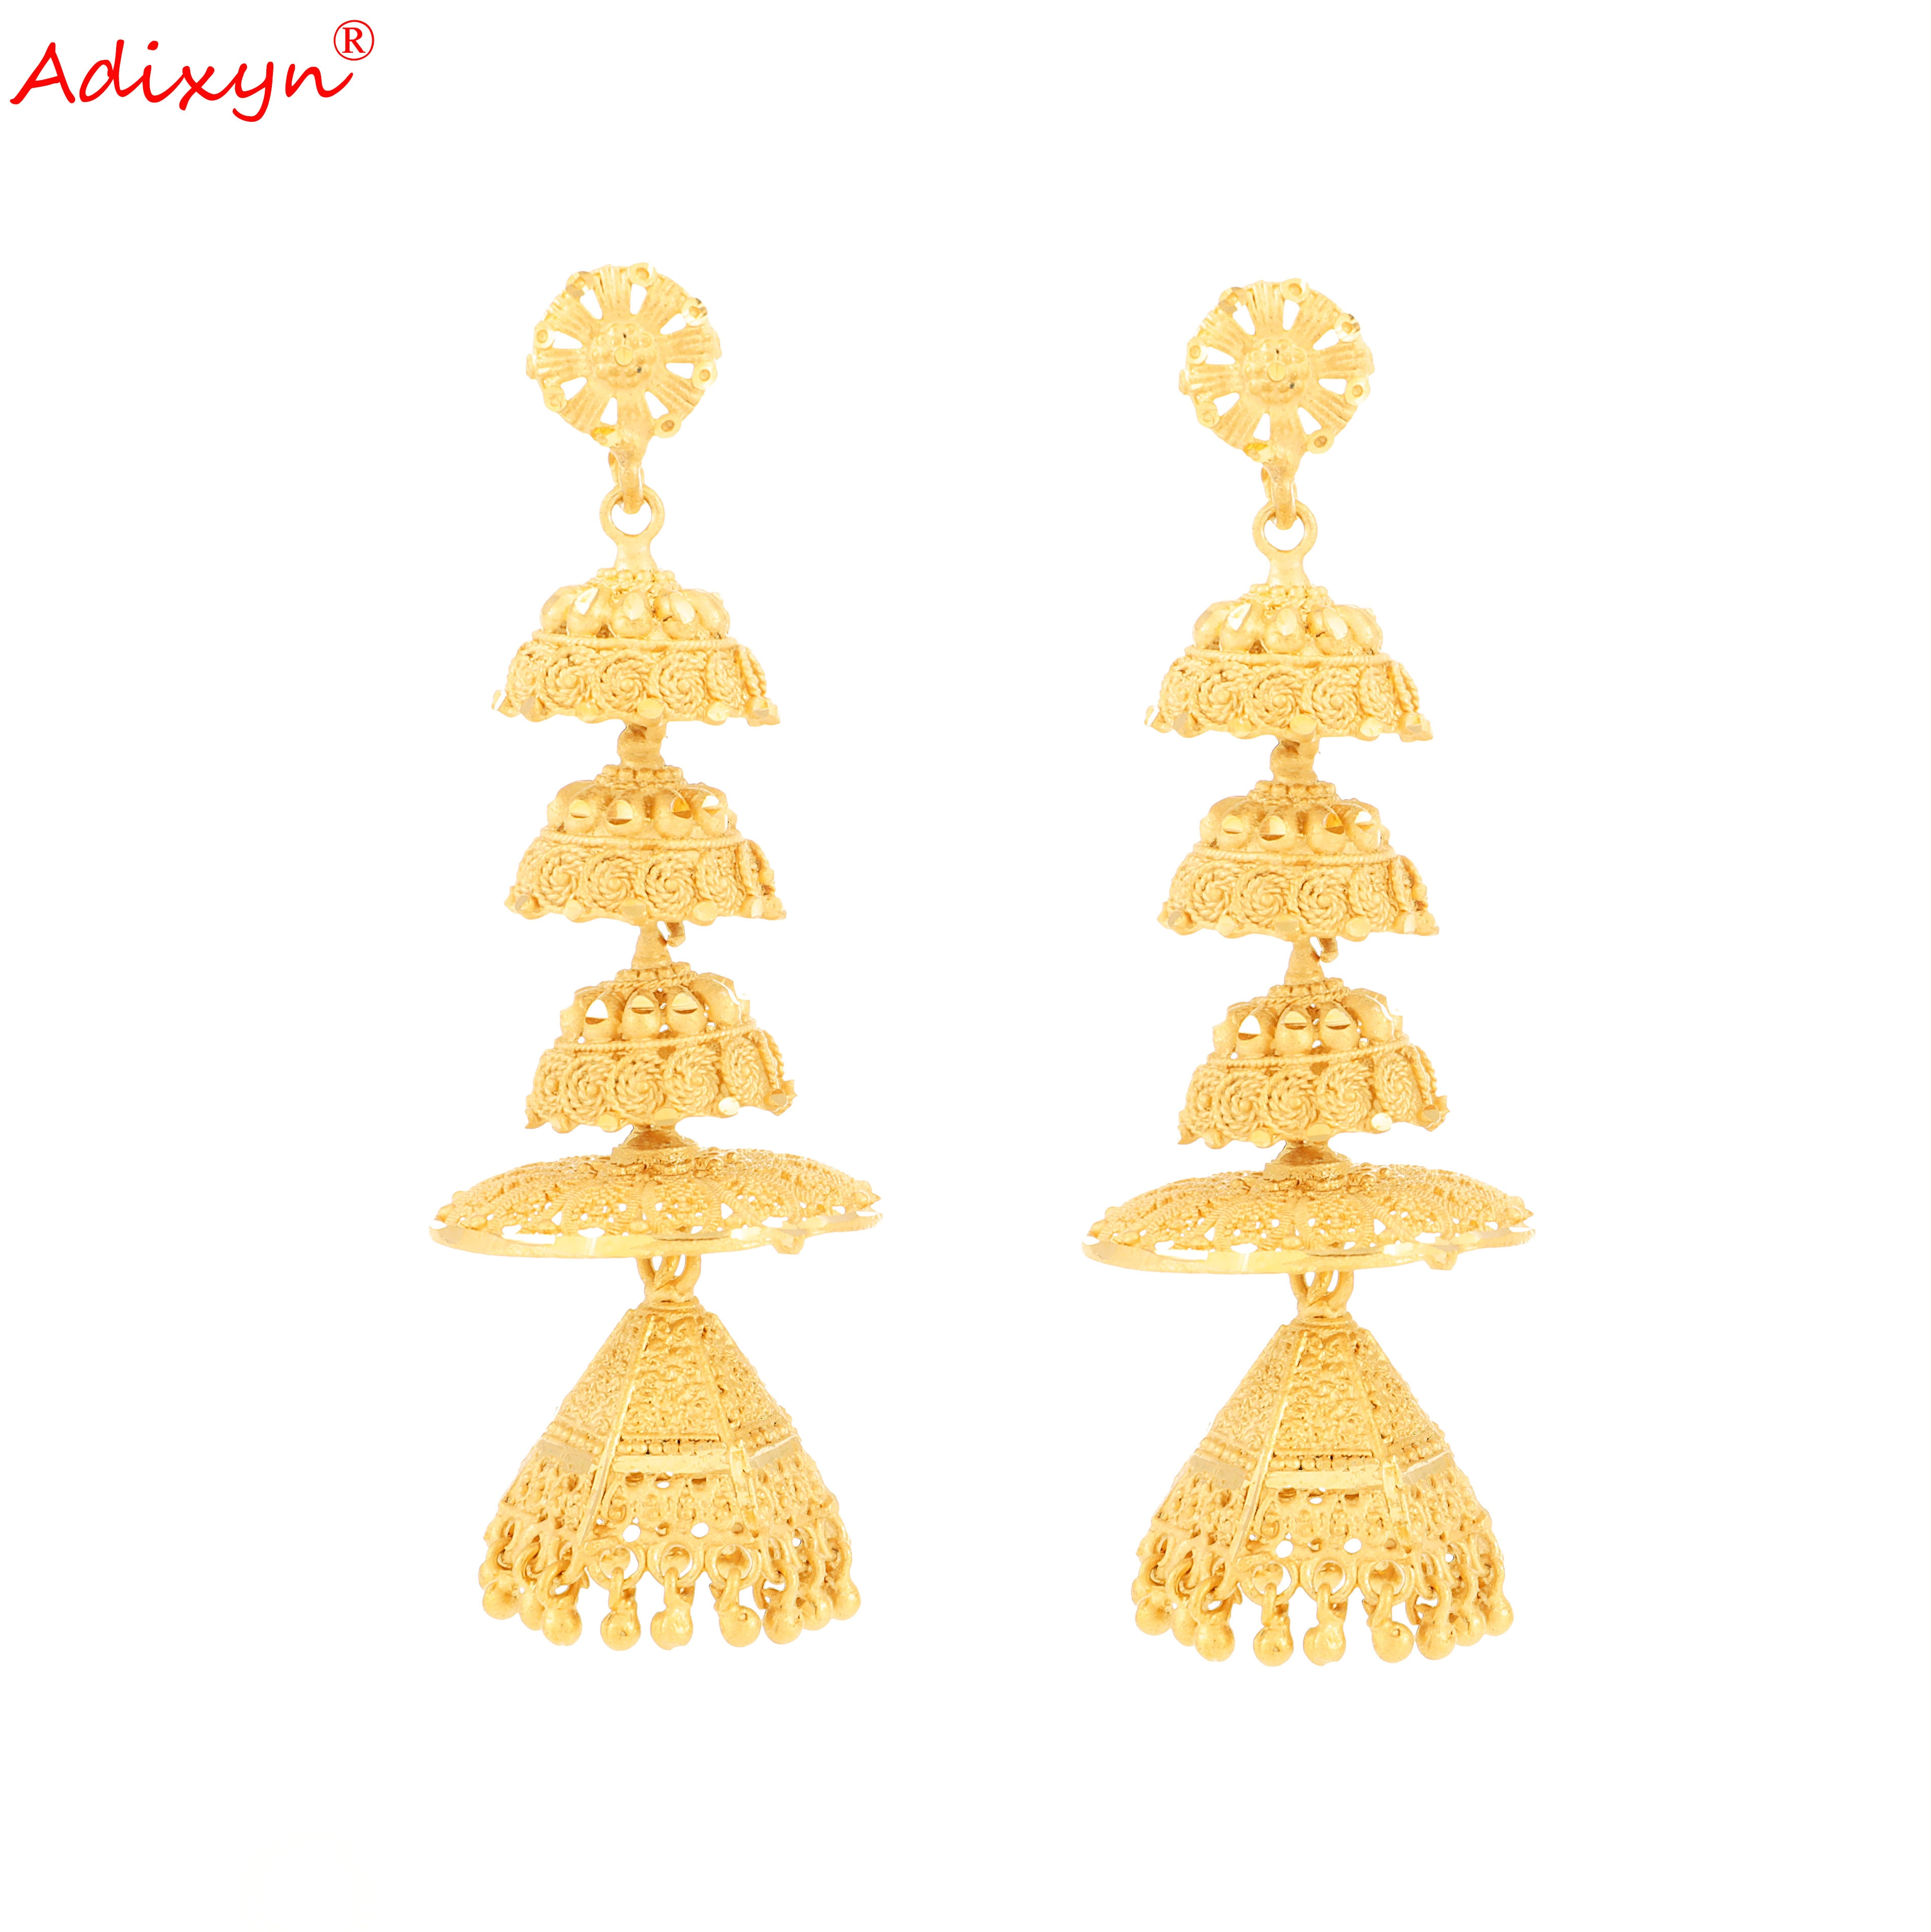 Adixyn-أقراط على شكل قبعة ، مجوهرات ذهبية اللون ، مجوهرات نحاسية أفريقية/إثيوبية/دبي للنساء/الفتيات ، هدايا